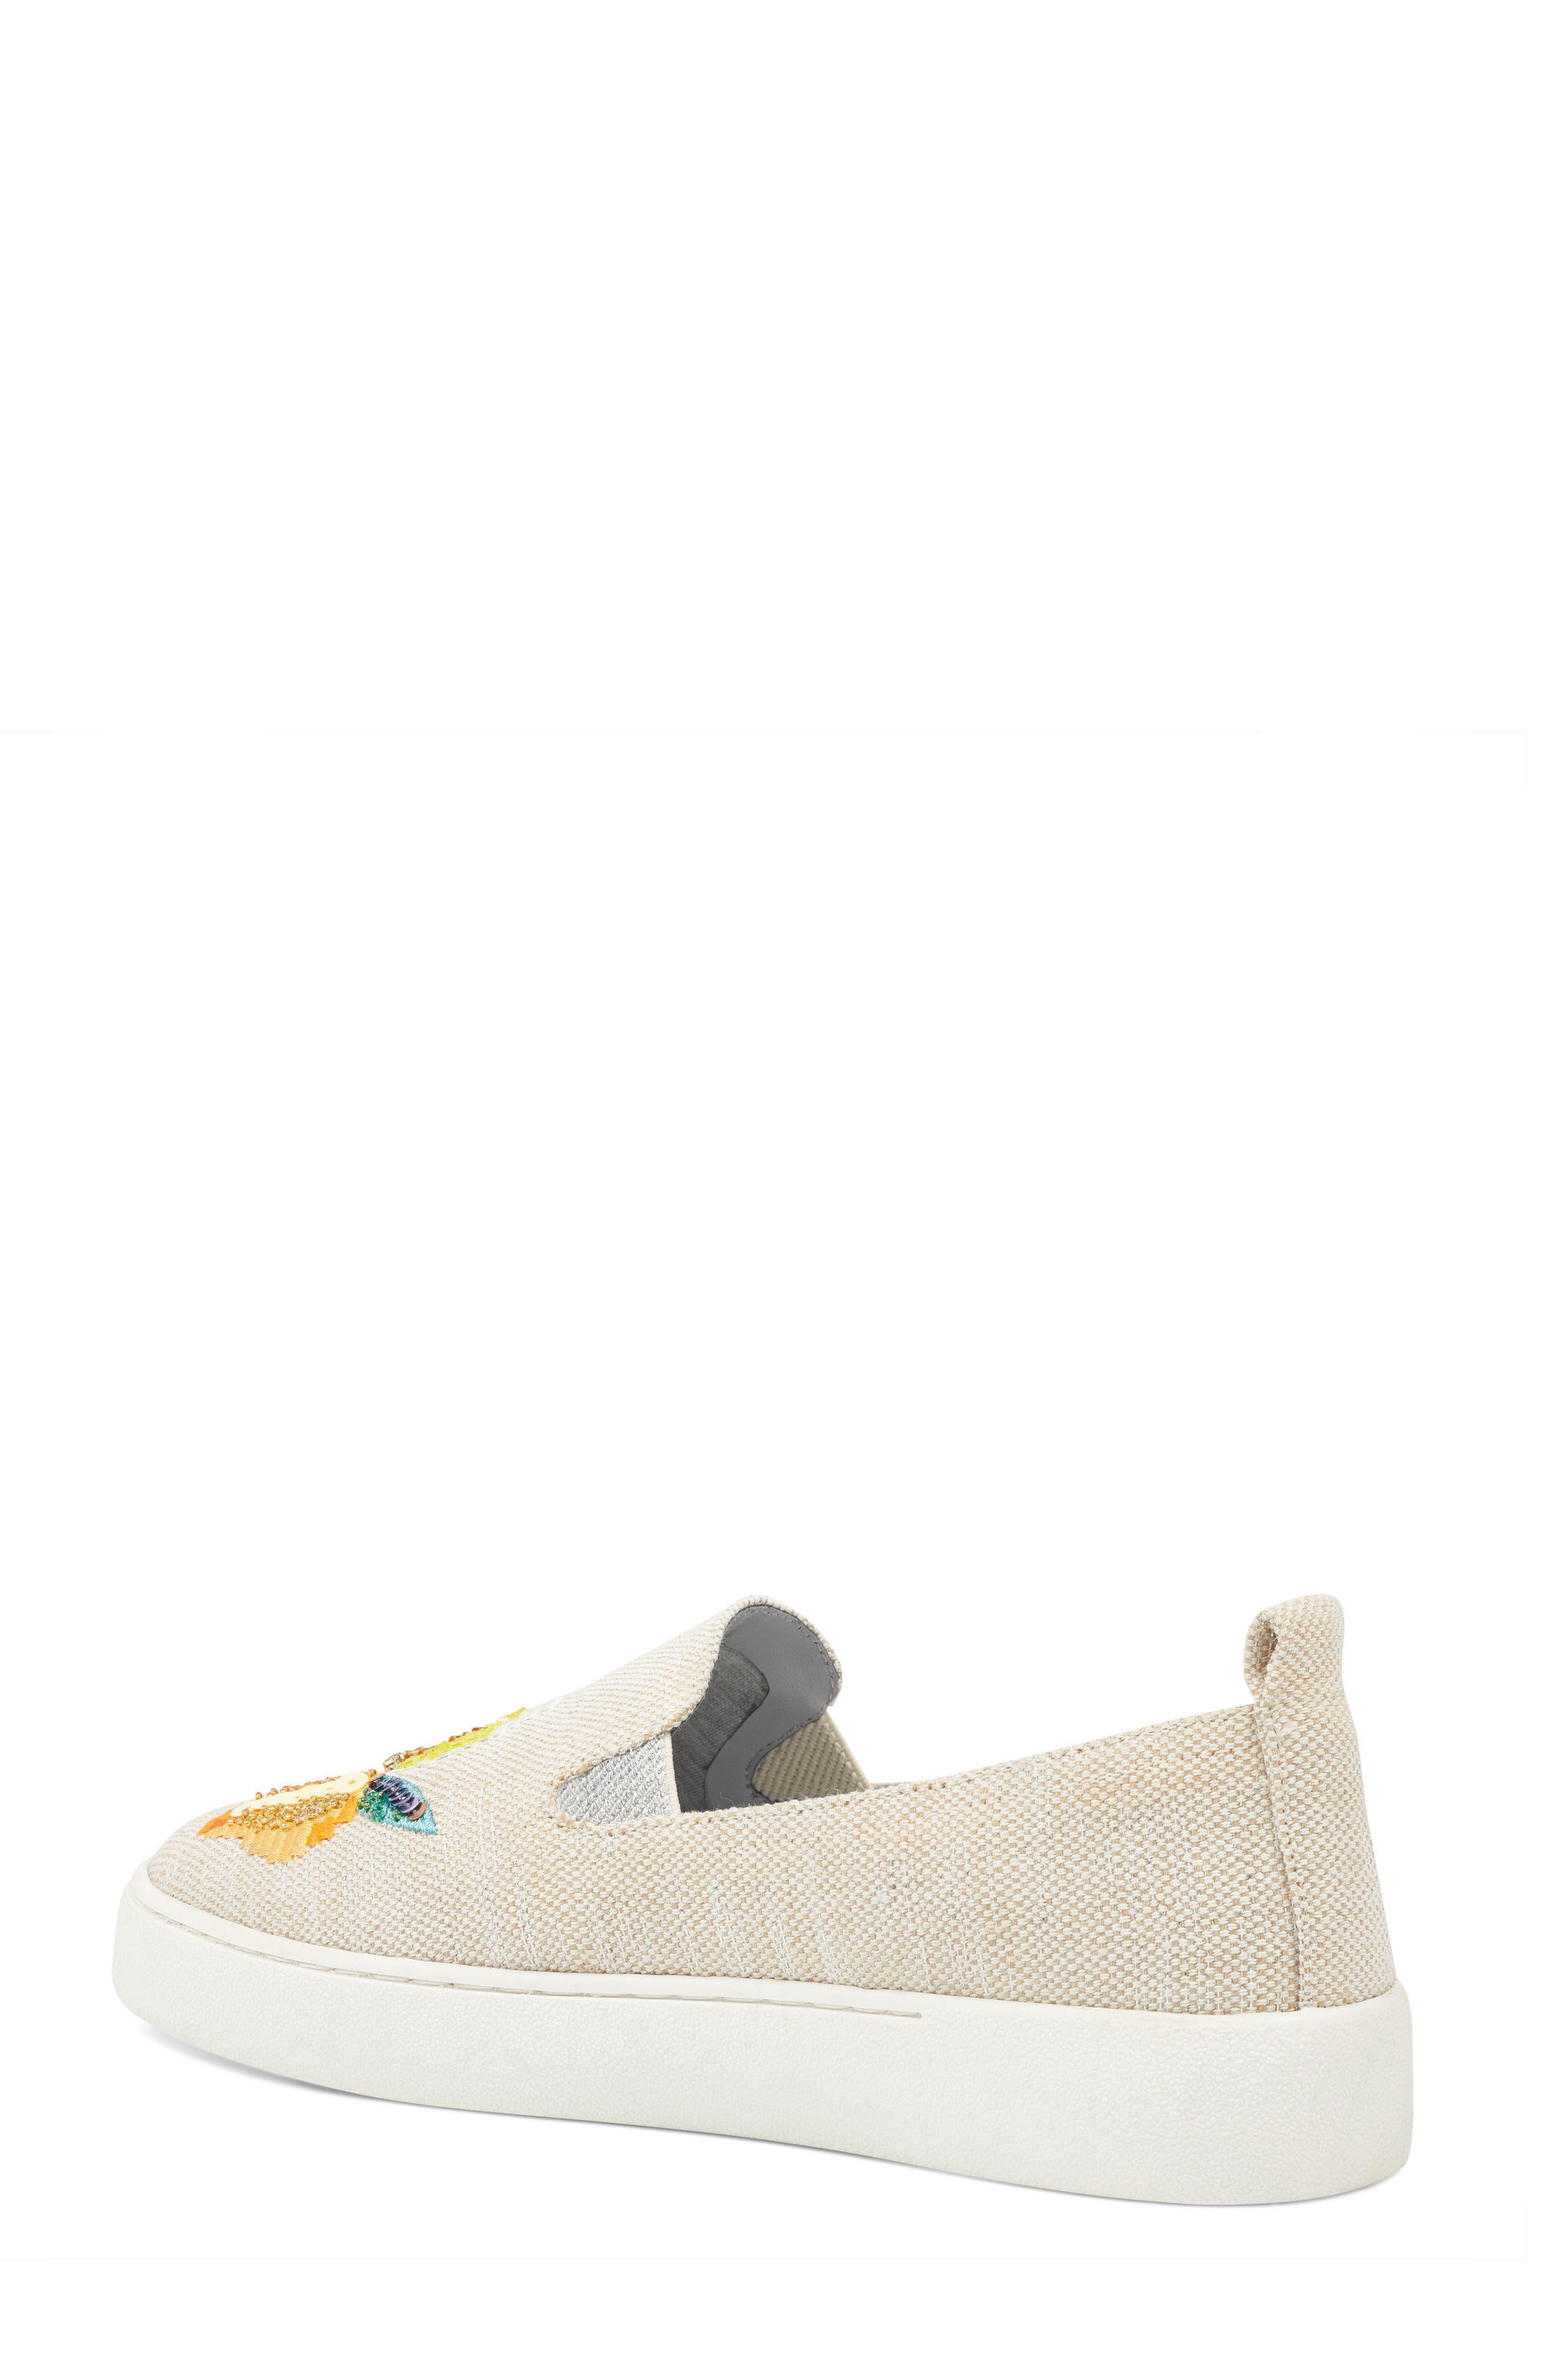 Playavista Slip-On Sneaker,                             Alternate thumbnail 2, color,                             270